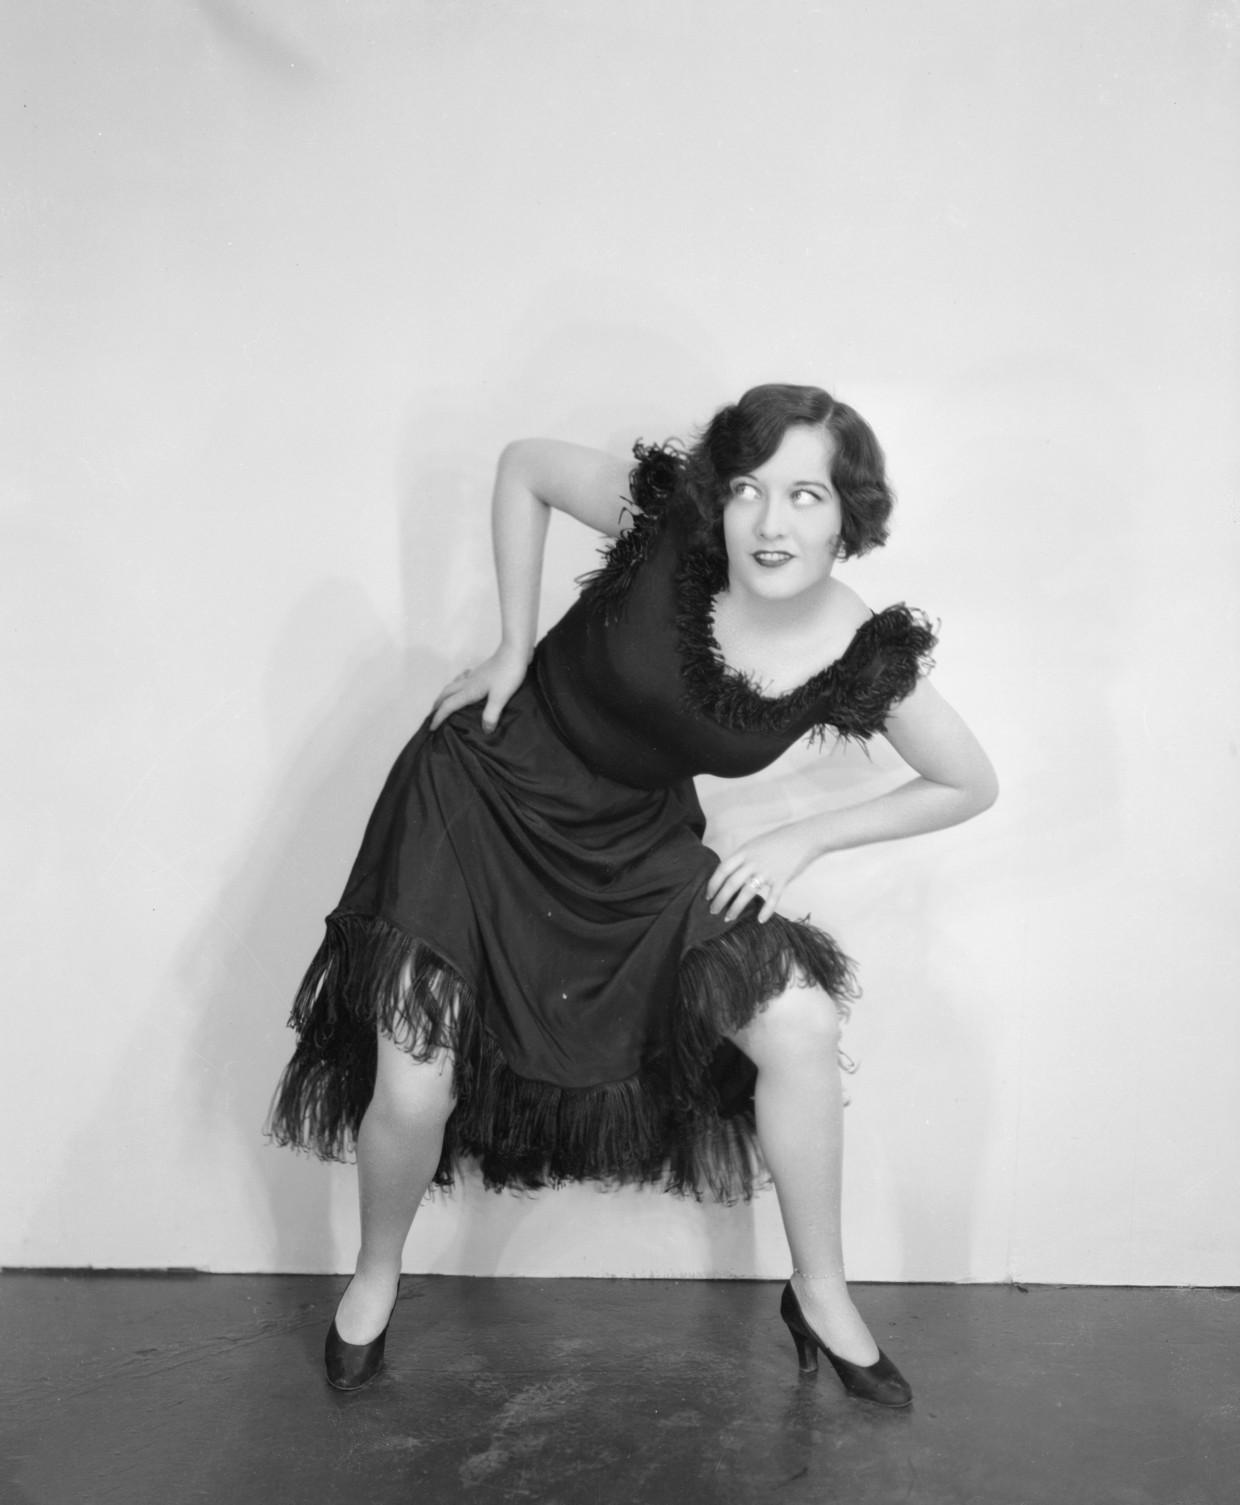 De Amerikaanse actrice Joan Crawford in 1926. Beeld Getty